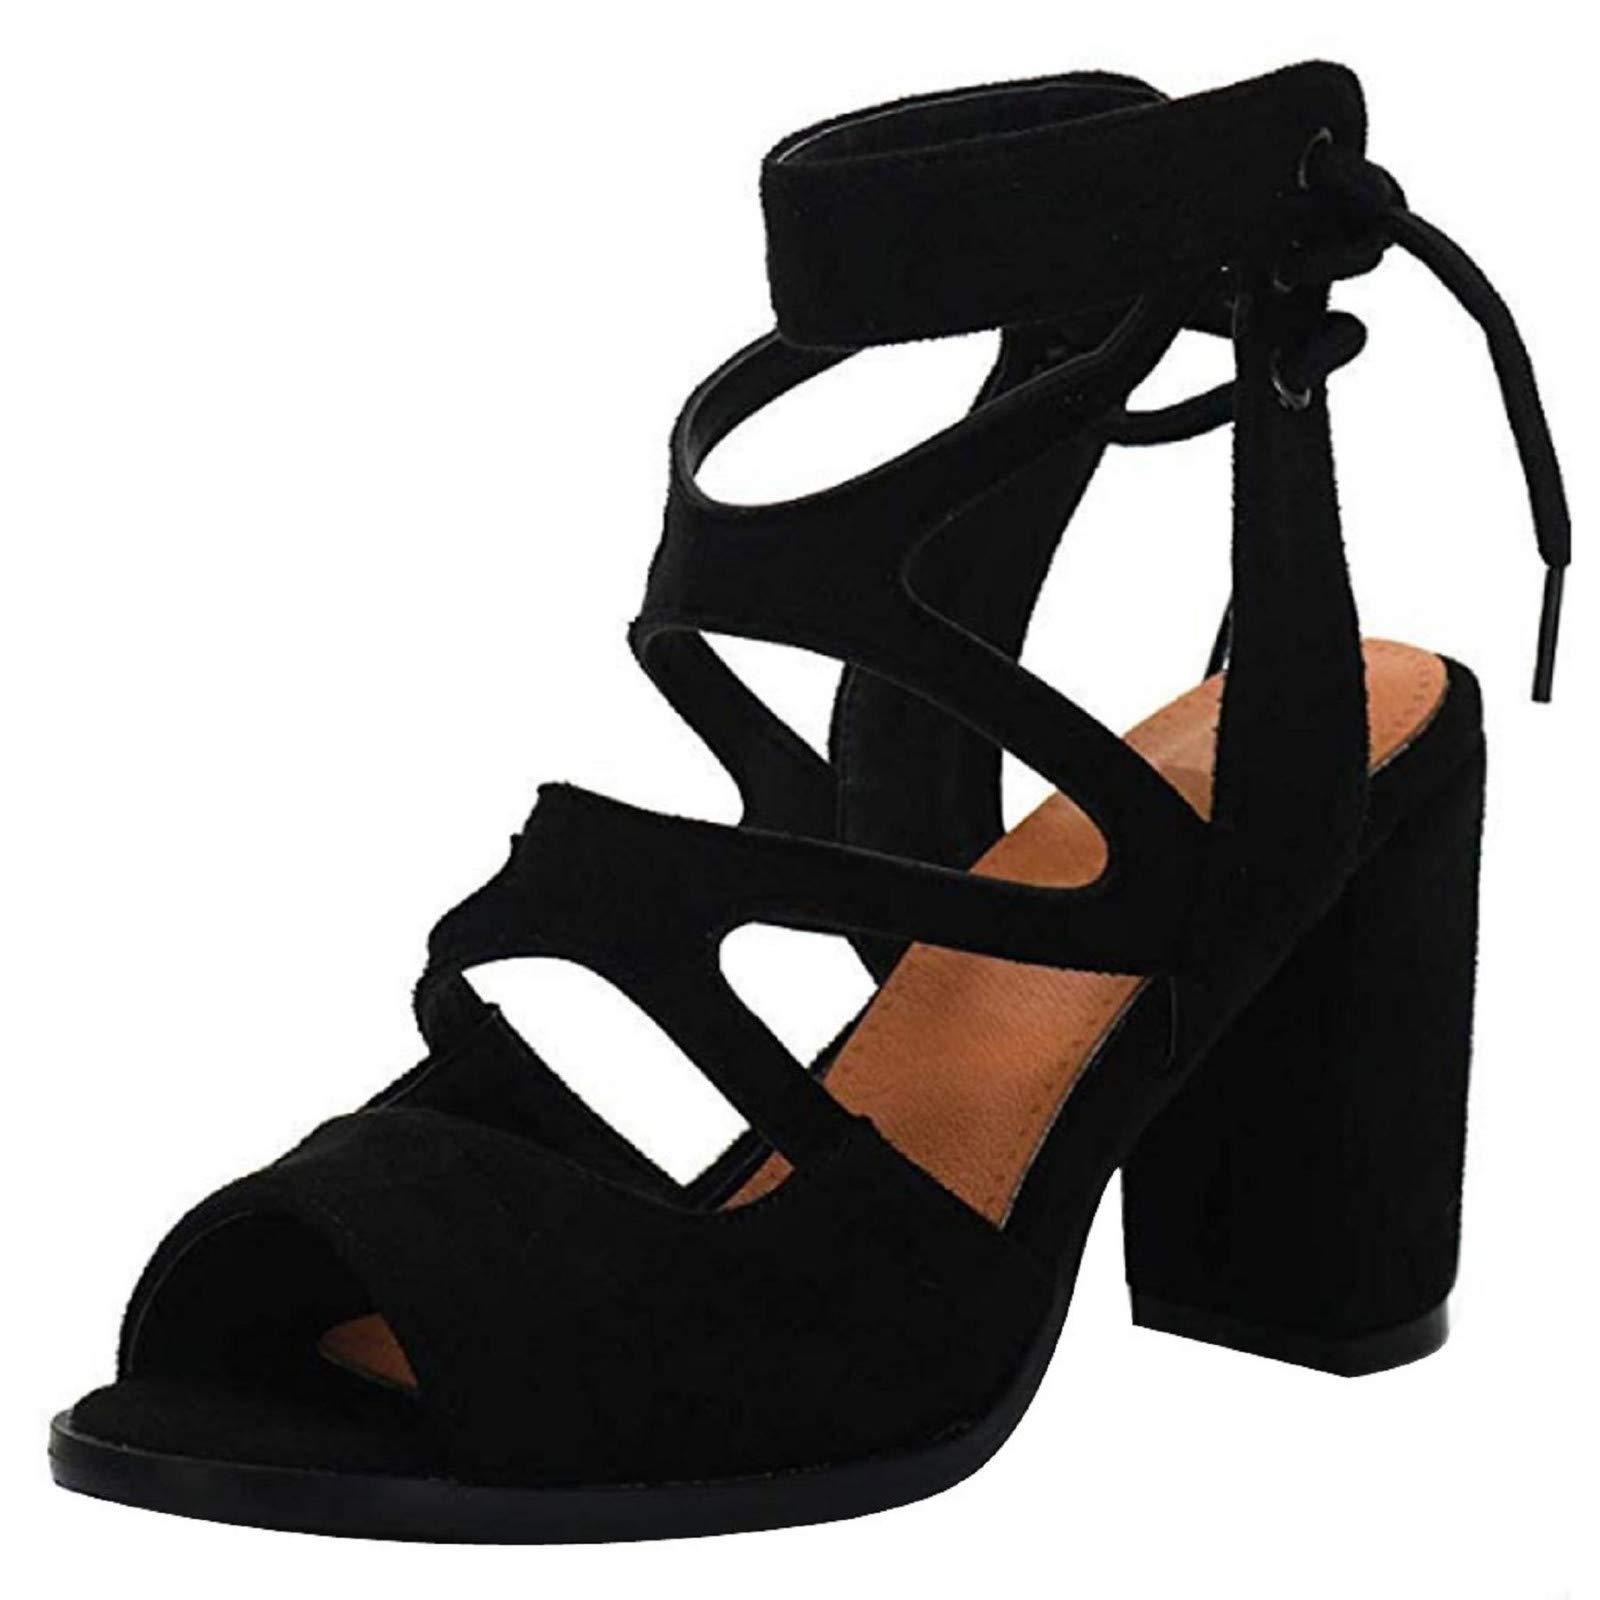 Women Chunky Heel Strappy Sandals Peep Toe Lace up Gladiator Sandals Ankel Strap Block Heel Black